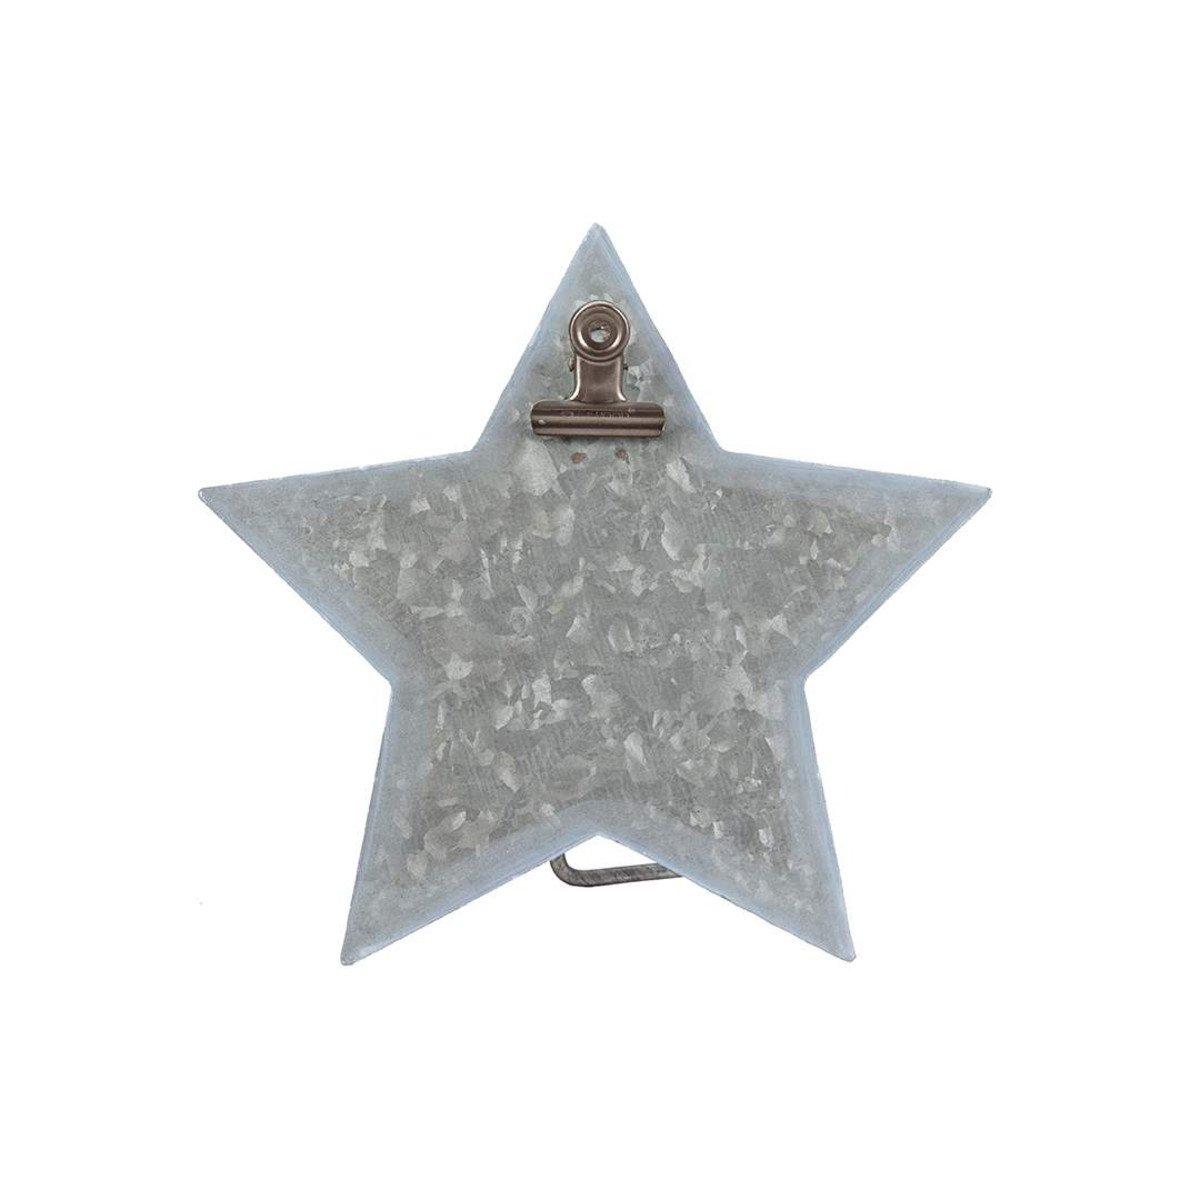 Stacy West | Buttermilk Basin Metal Easel Star STM-20379